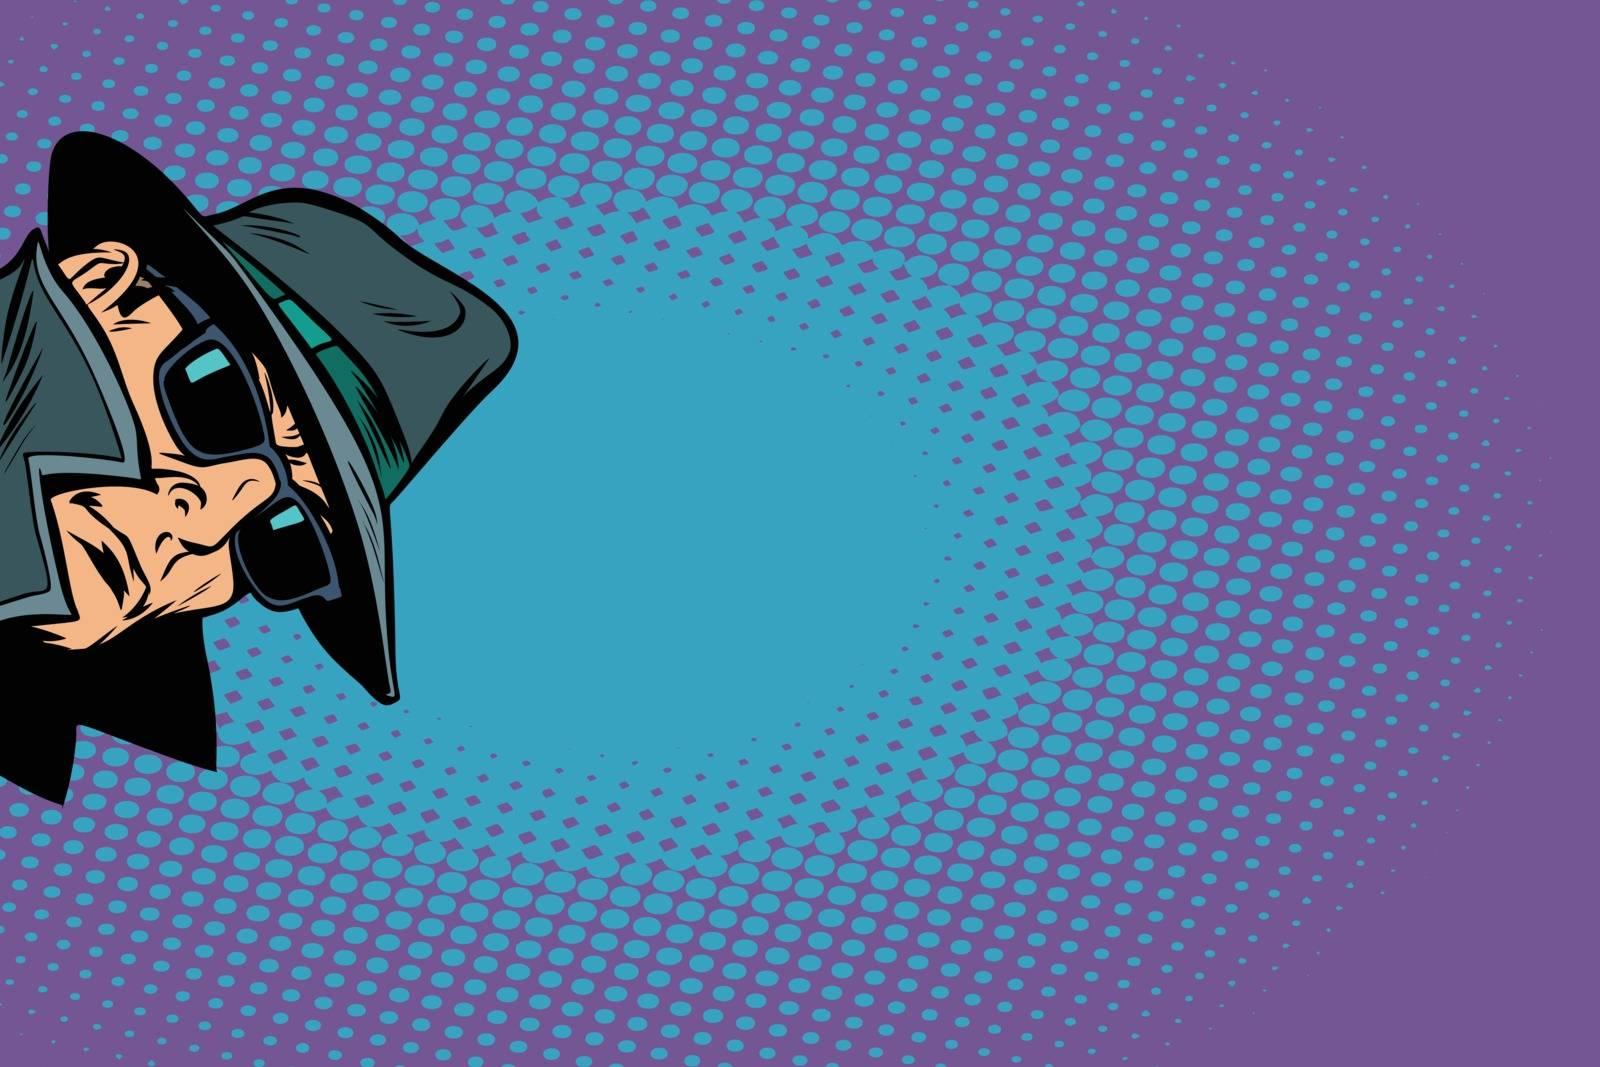 spy. surveillance and hacking. Comic cartoon pop art retro vector illustration